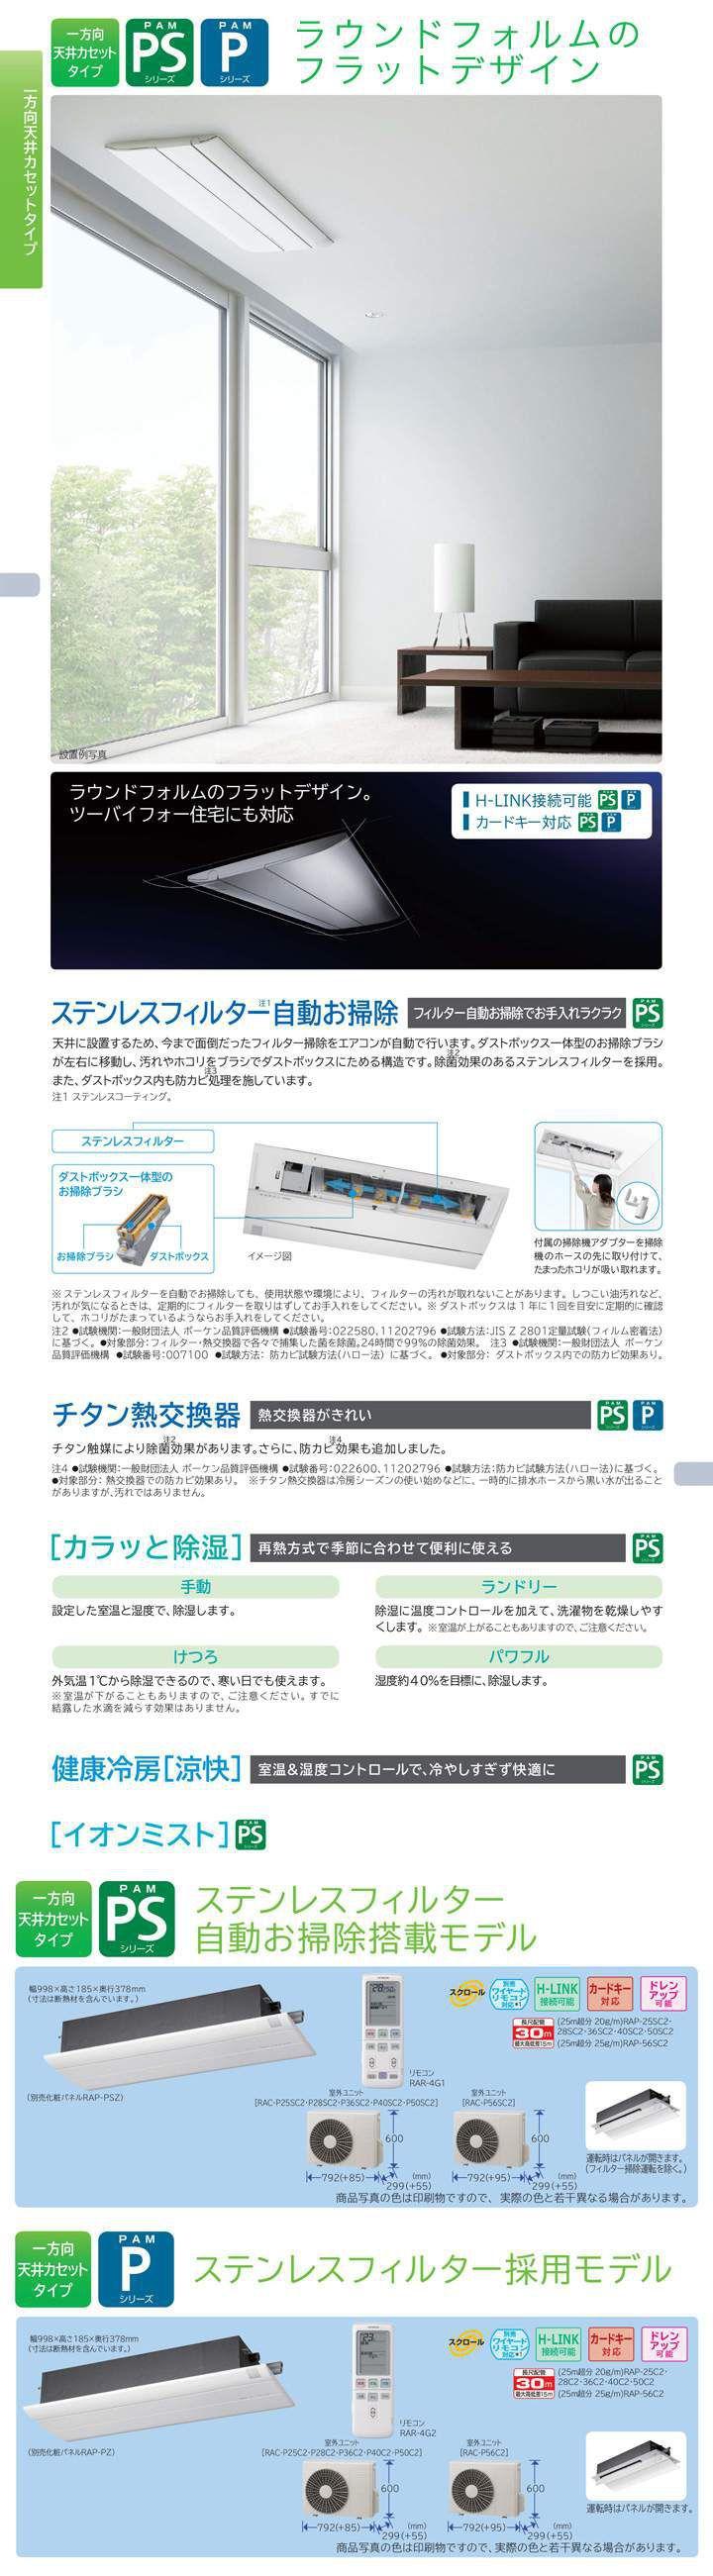 RAP-36SC2カタログ